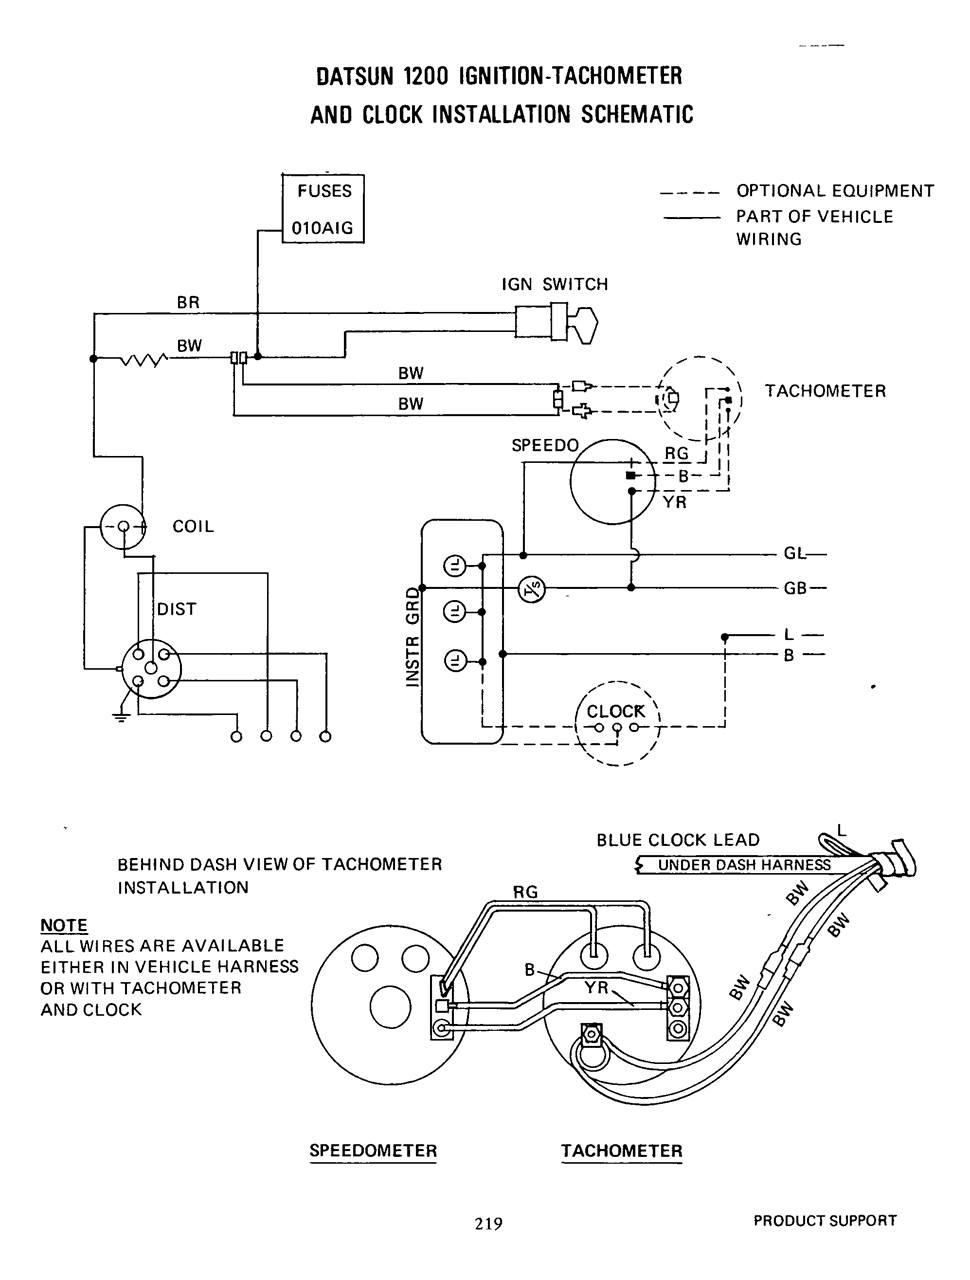 Tech Wiki - Tachometer Wiring : Datsun 1200 Club Nissan Engine Wiring Diagram on 2010 chrysler town and country engine diagram, nissan fuel system diagram, transmission wiring diagram, nissan 2.4 timing marks, nissan 3.3 engine diagram, nissan 2.4 liter engine diagram, nissan engine specifications, nissan brakes diagram, nissan engine torque specs, nissan distributor diagram, honda wiring diagram, nissan exhaust system diagram, toyota wiring diagram, nissan transfer case diagram, nissan engine valves, 2002 nissan xterra vacuum line diagram, nissan suspension diagram, nissan transmission diagram, nissan maxima engine part diagram, nissan radiator diagram,